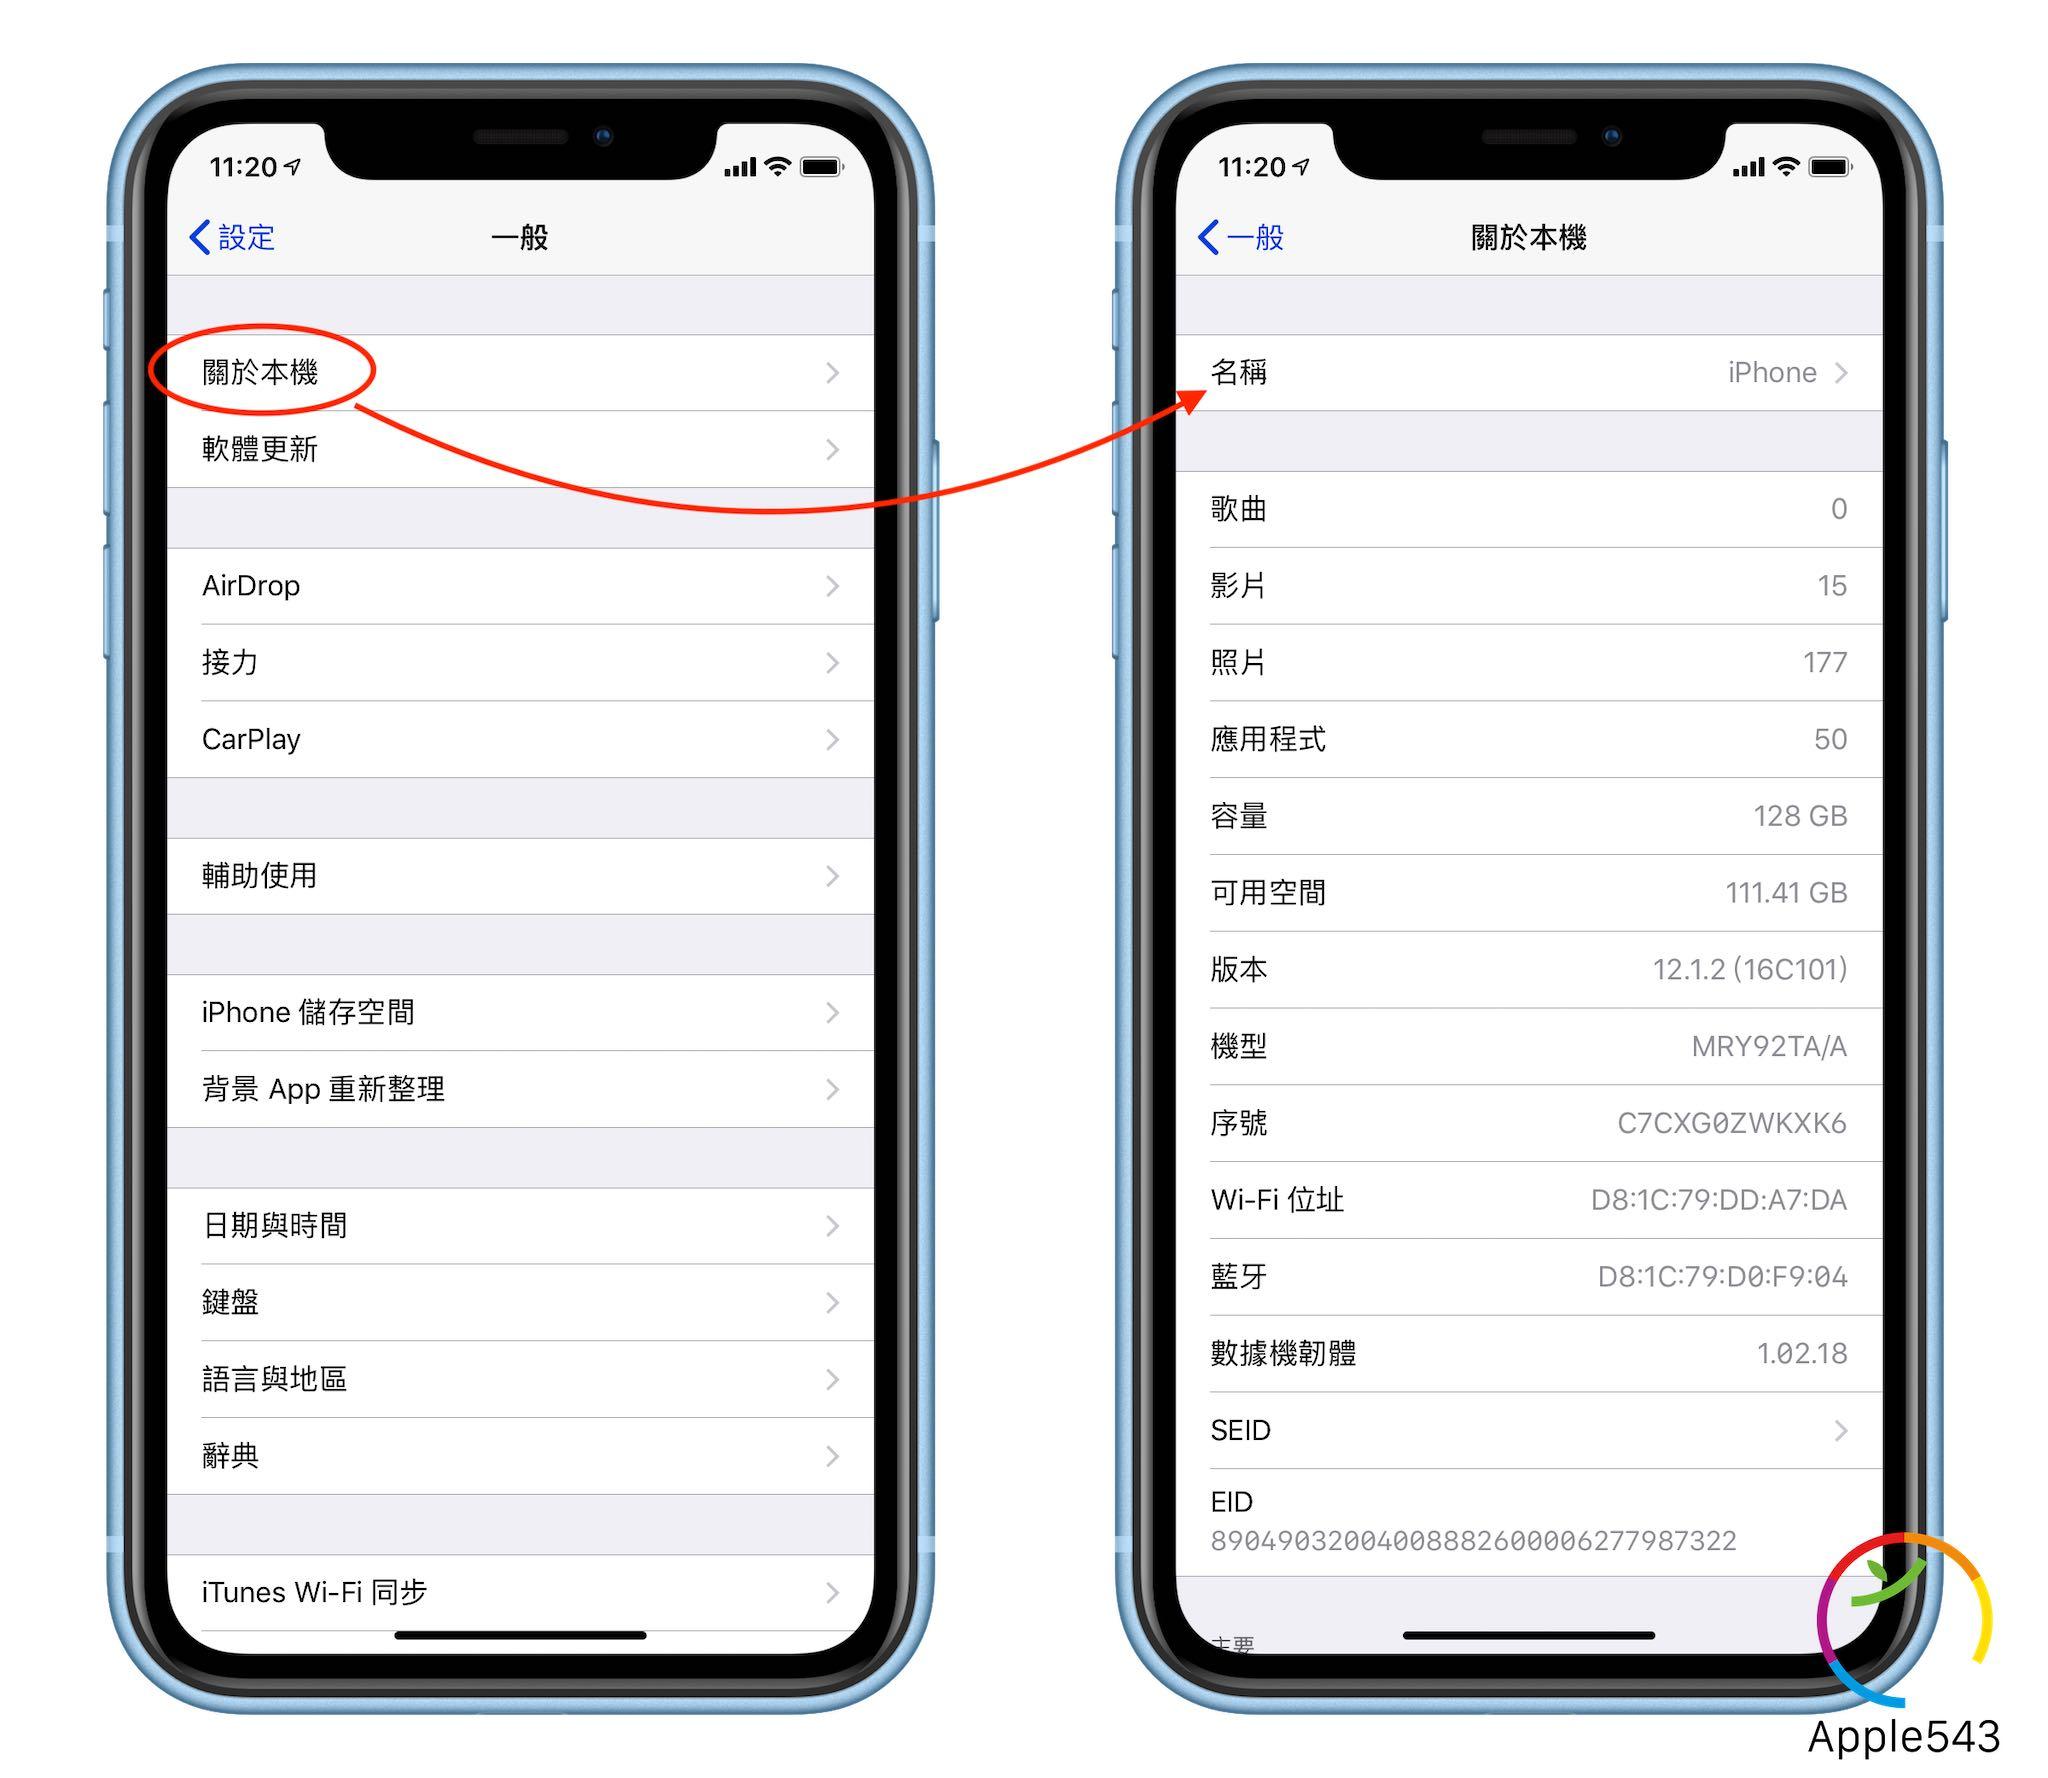 iPhone 個人熱點 名稱怎麼修改?改本機名稱就好了!- Apple543 找教學